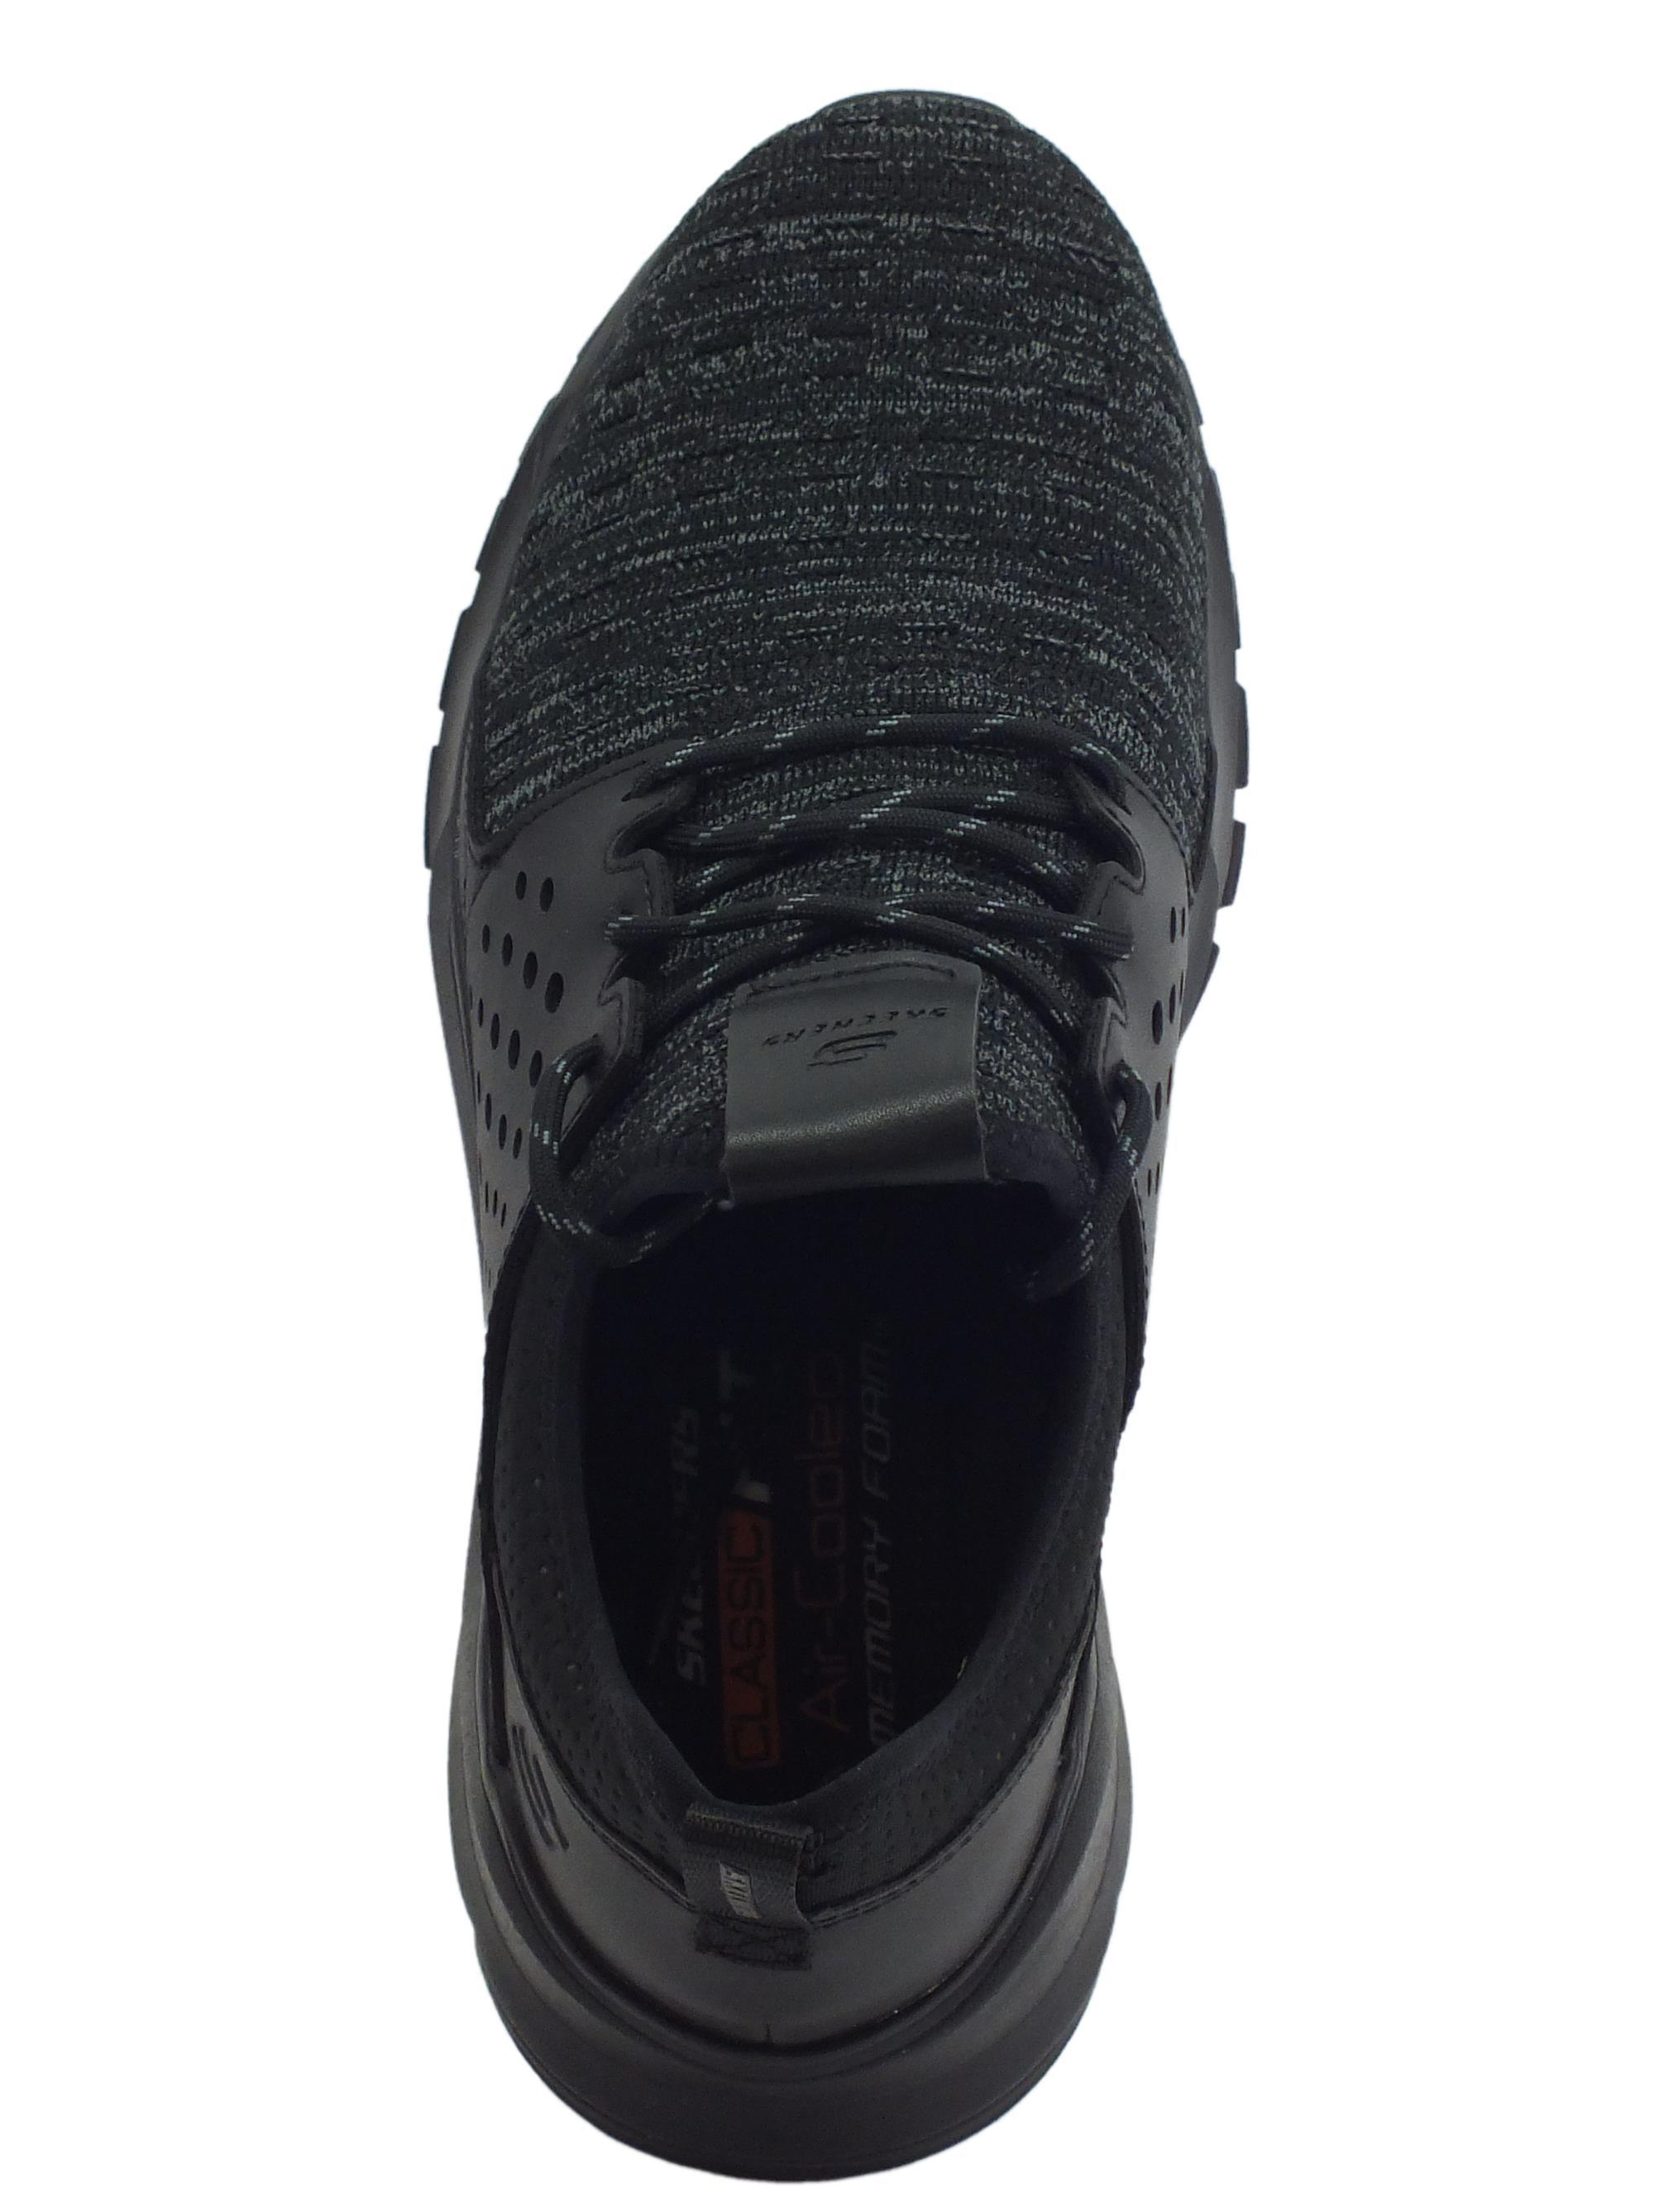 Scarpe Skechers Streetwear VELTON uomo tessuto nero - Vitiello Calzature 1507926b821